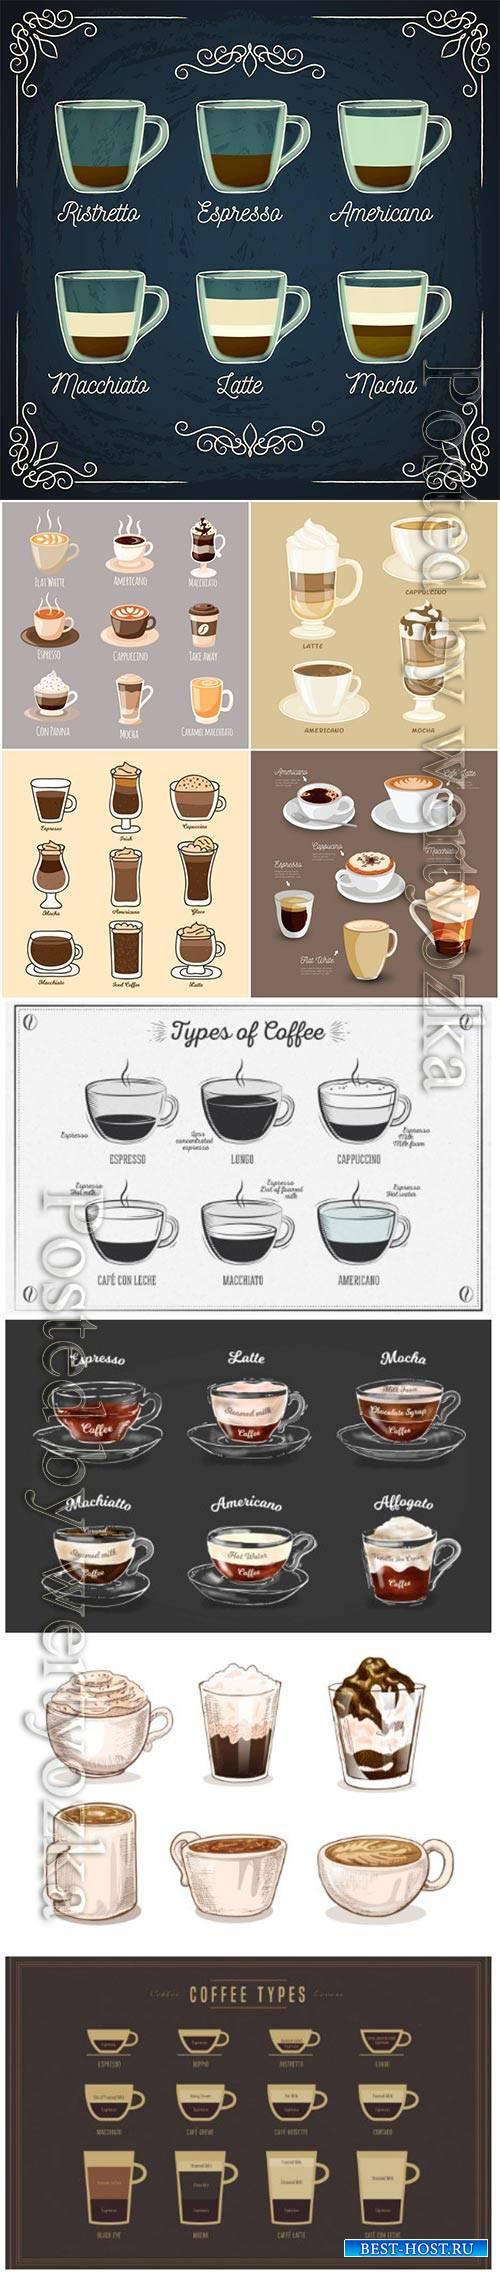 Vintage vector coffee types concept